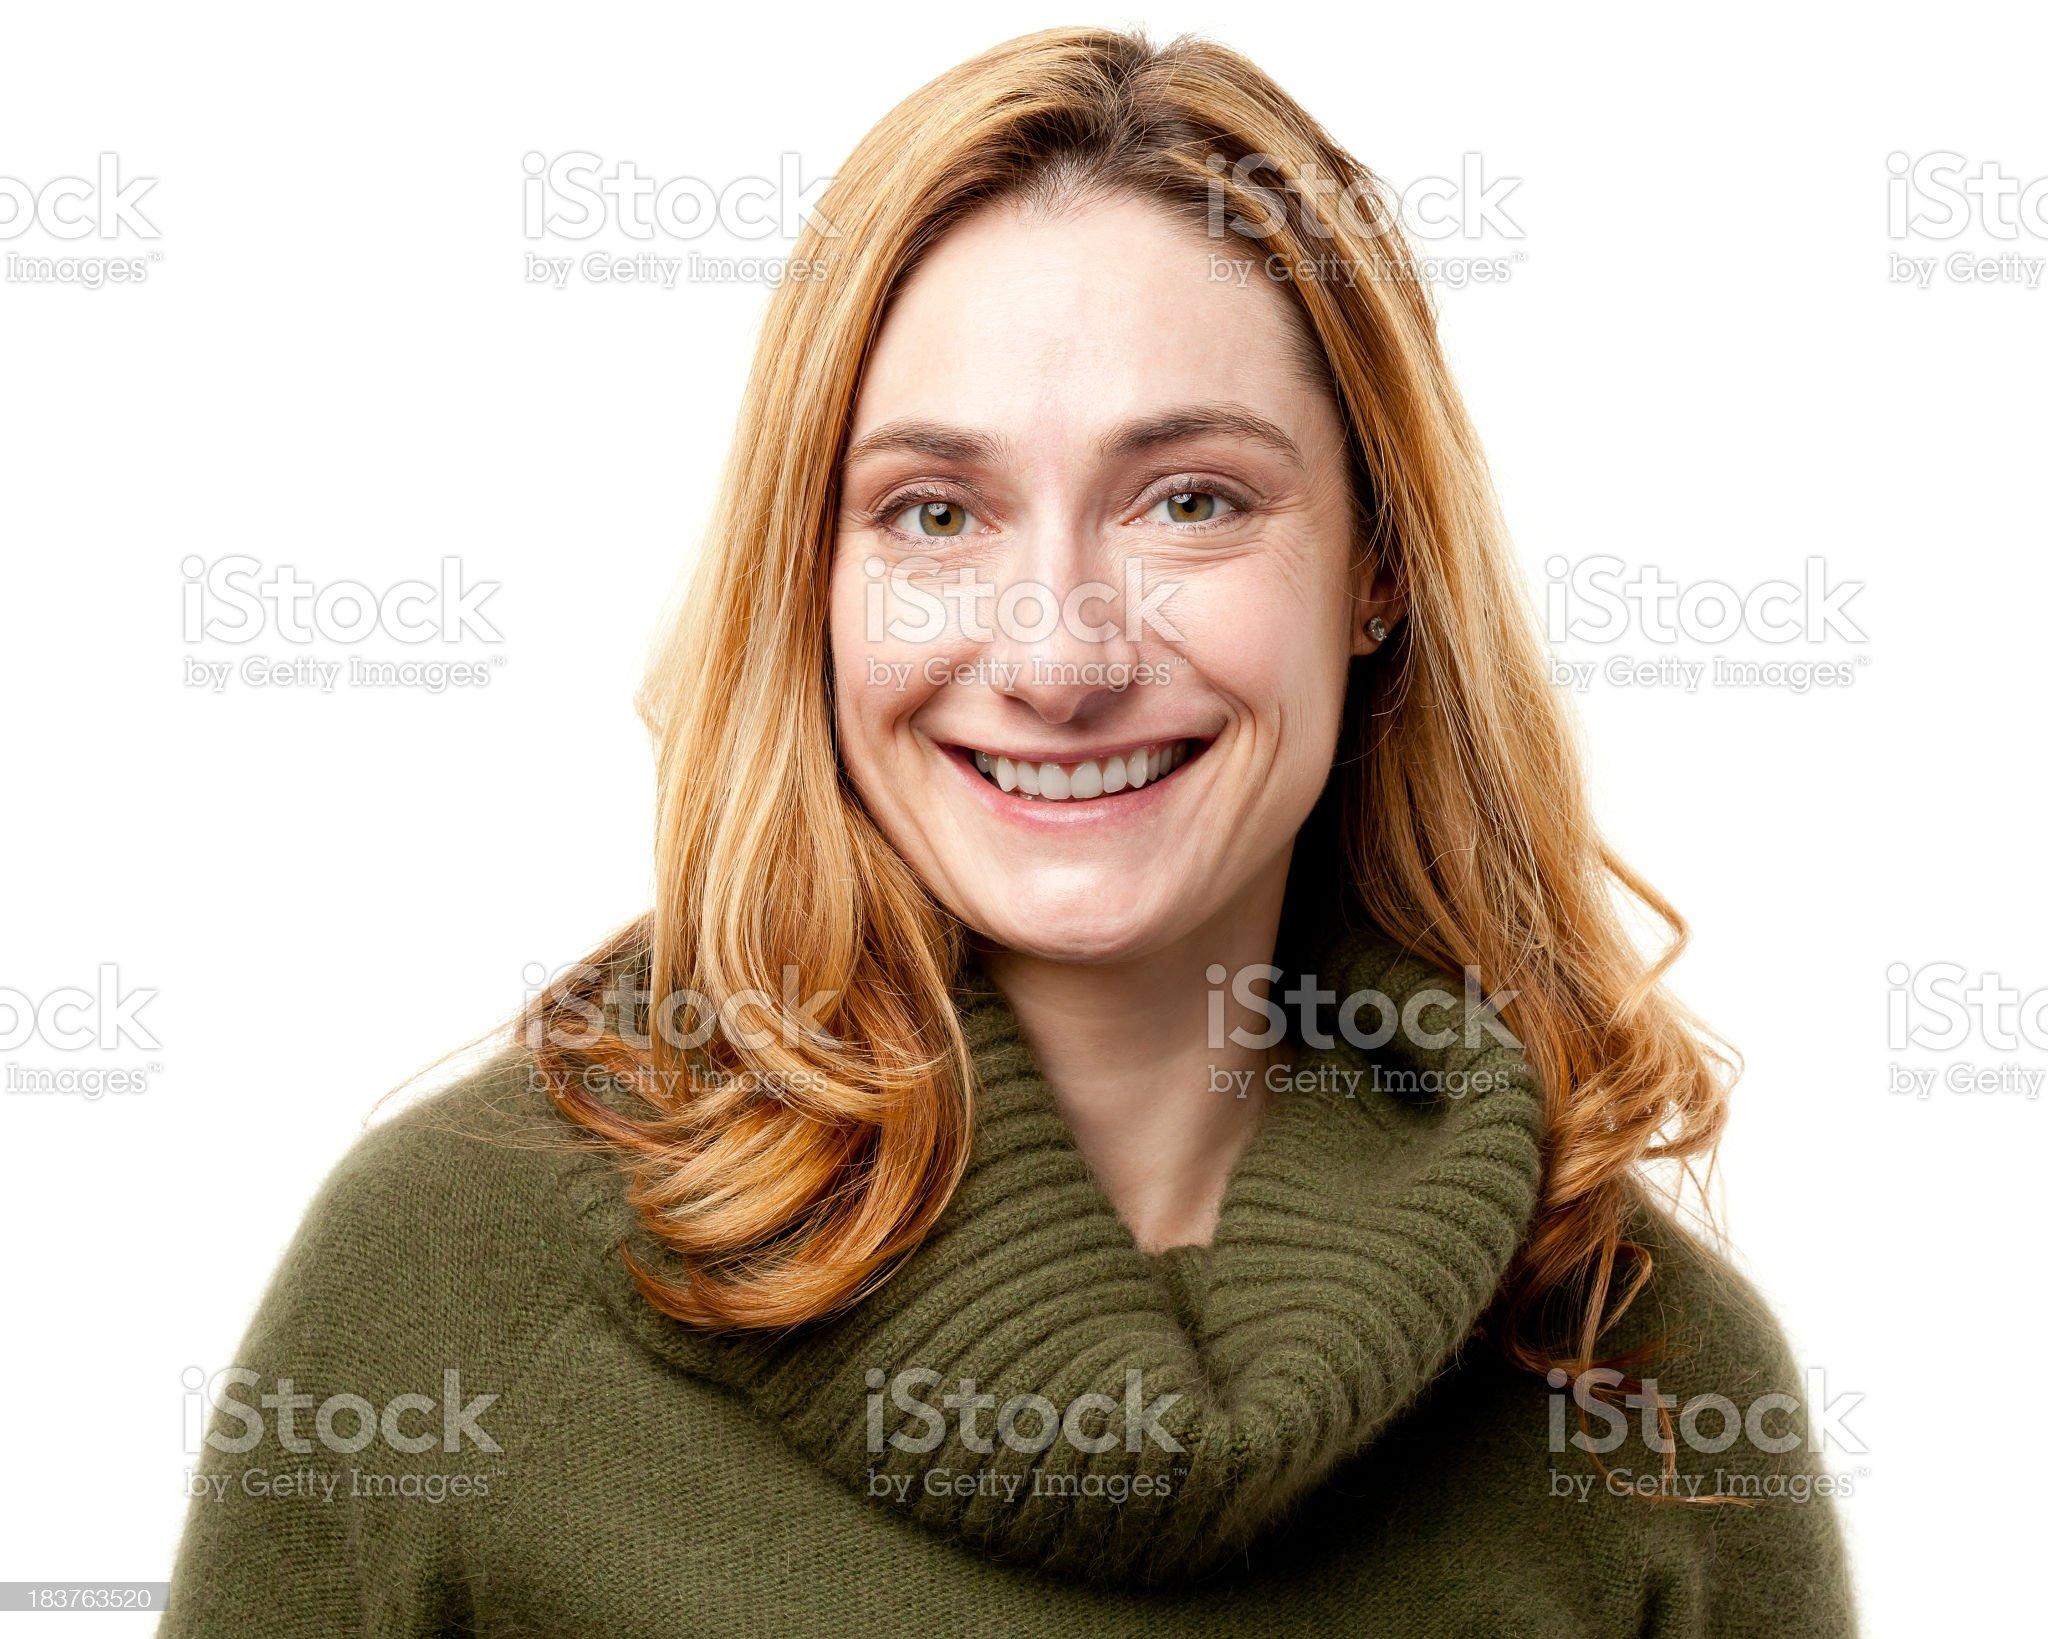 Female Portrait royalty-free stock photo